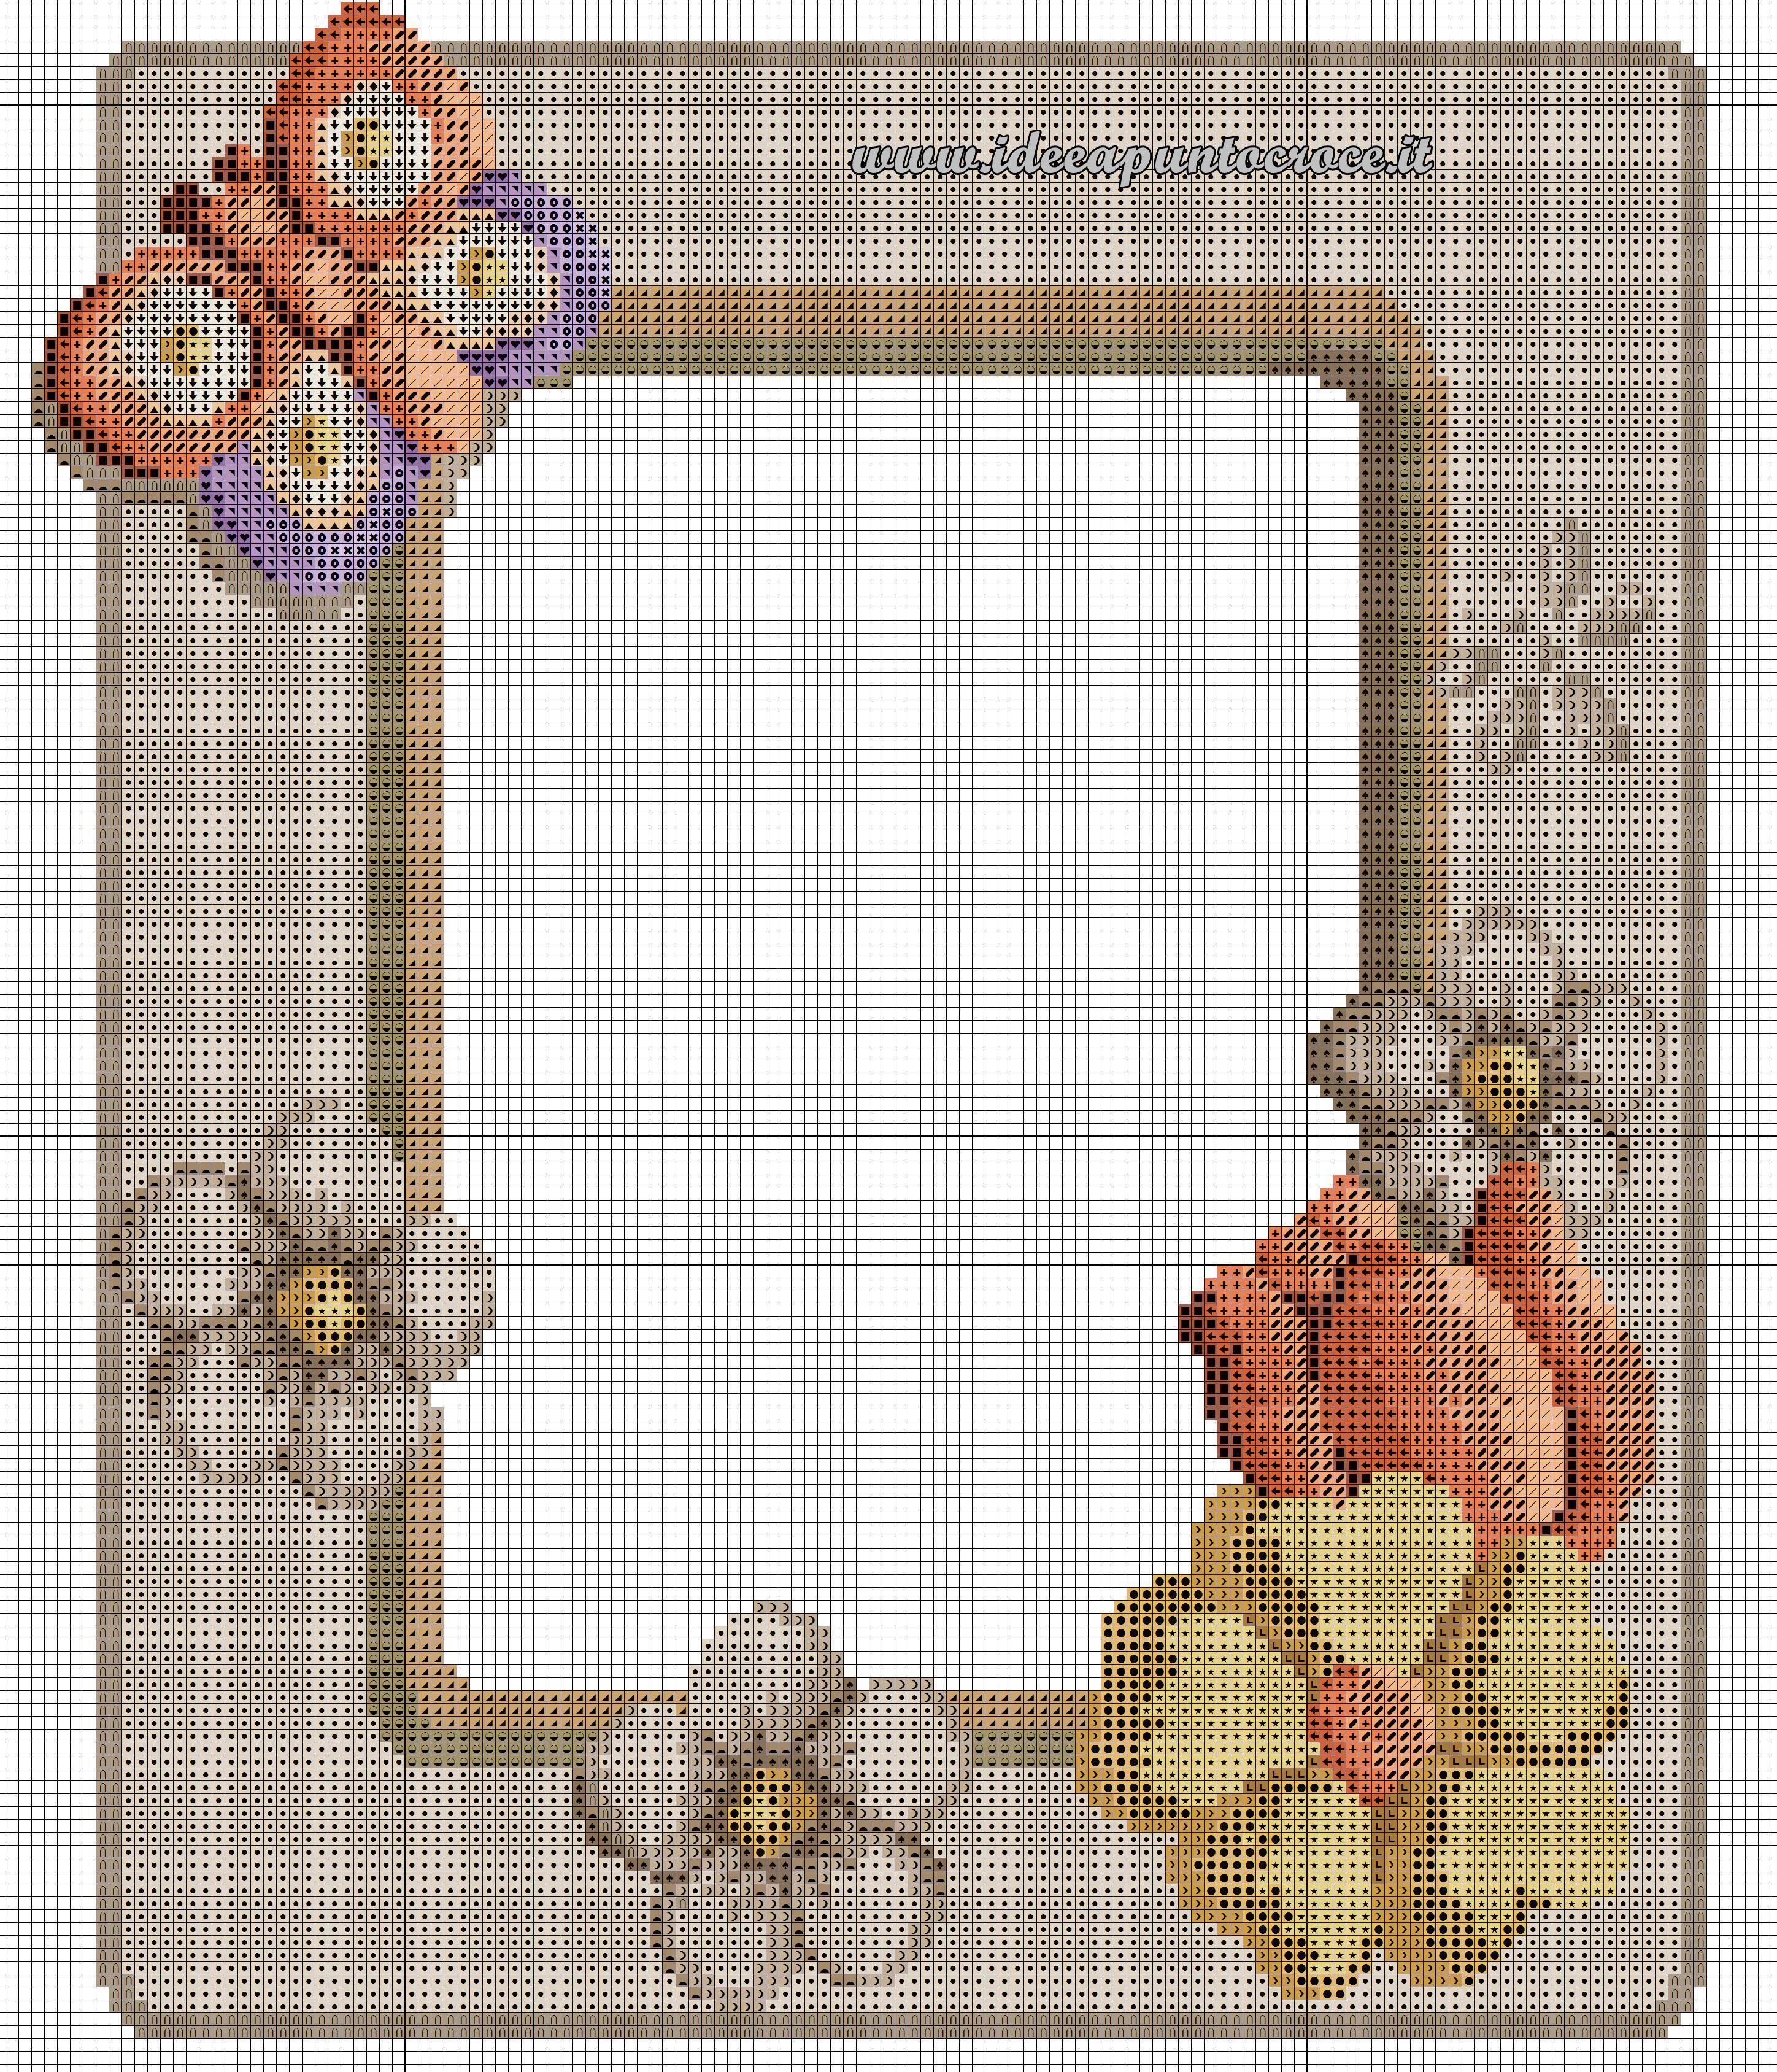 schema punto croce cornice Thun SCHEMI THUN Pinterest